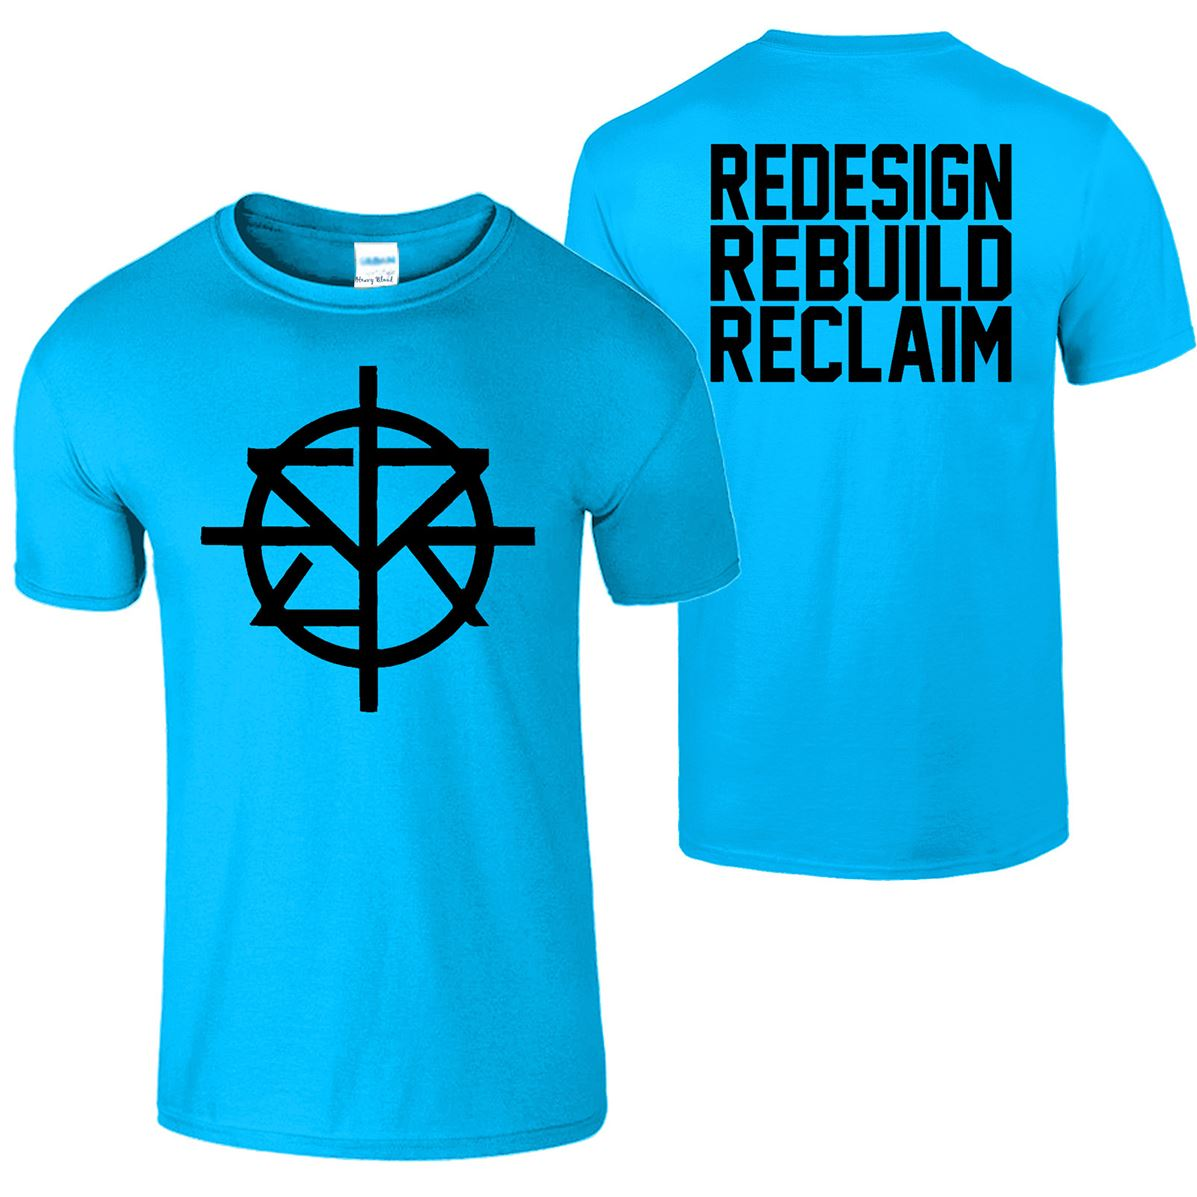 Seth Rollin Wwe Wrestling Redesign Rebuild Reclaim Logo